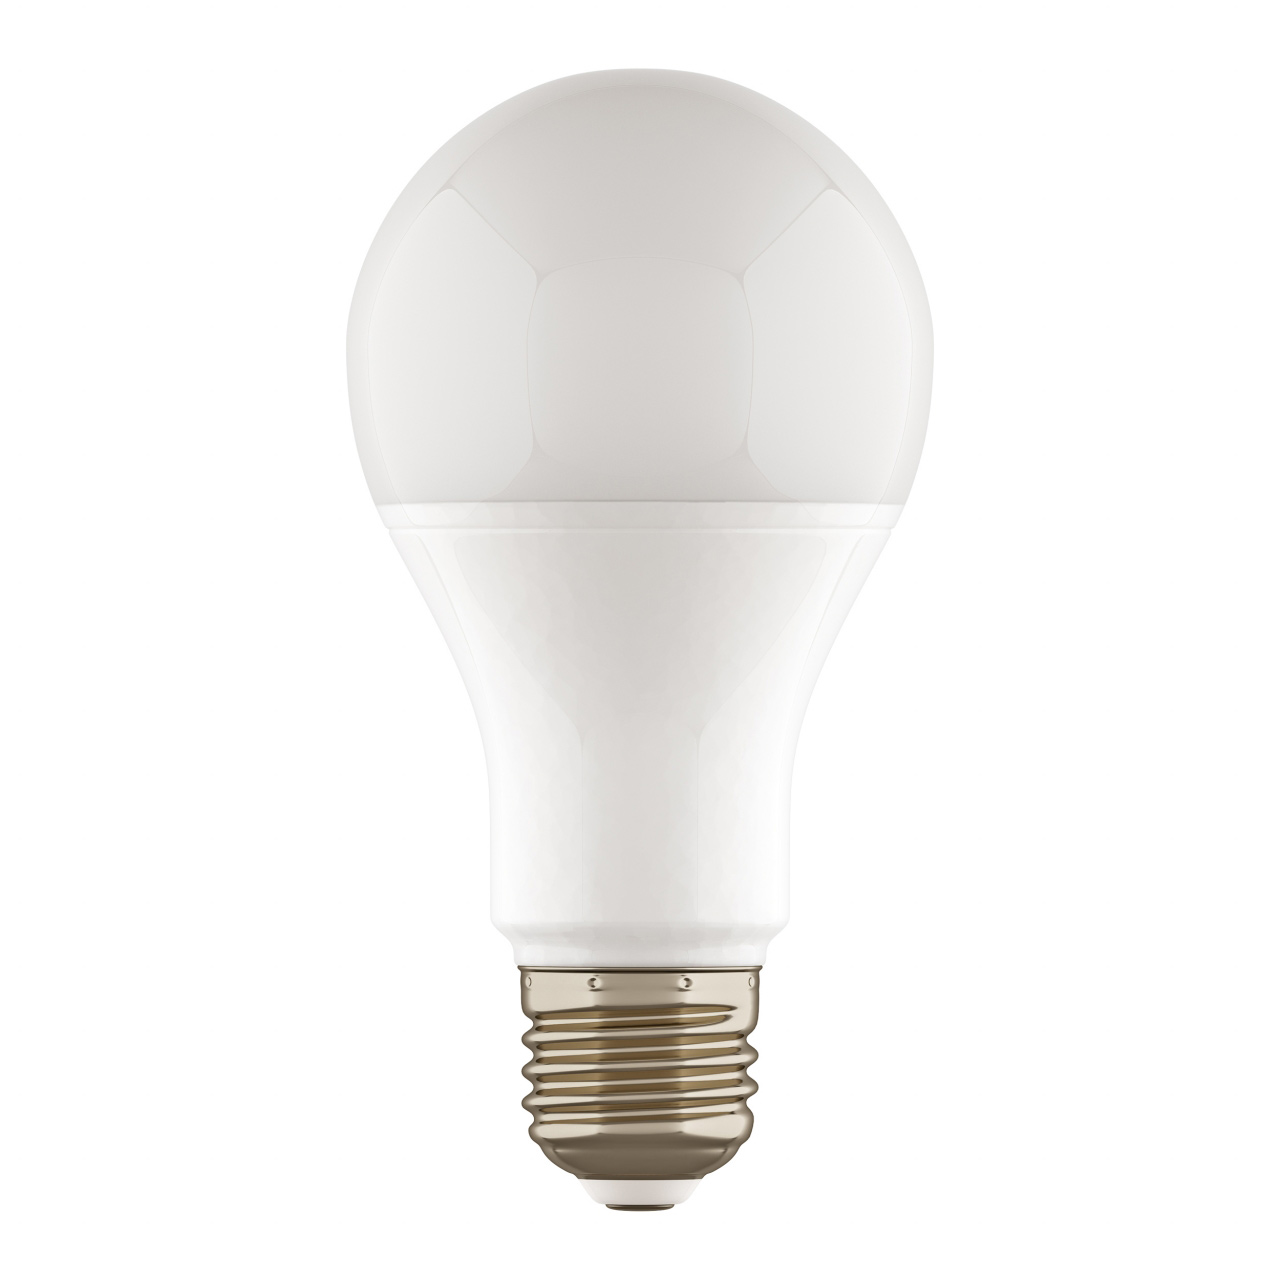 Лампа LED 220V A65 E27 12W=120W 950LM 180G FR 3000K 20000H Lightstar 930122